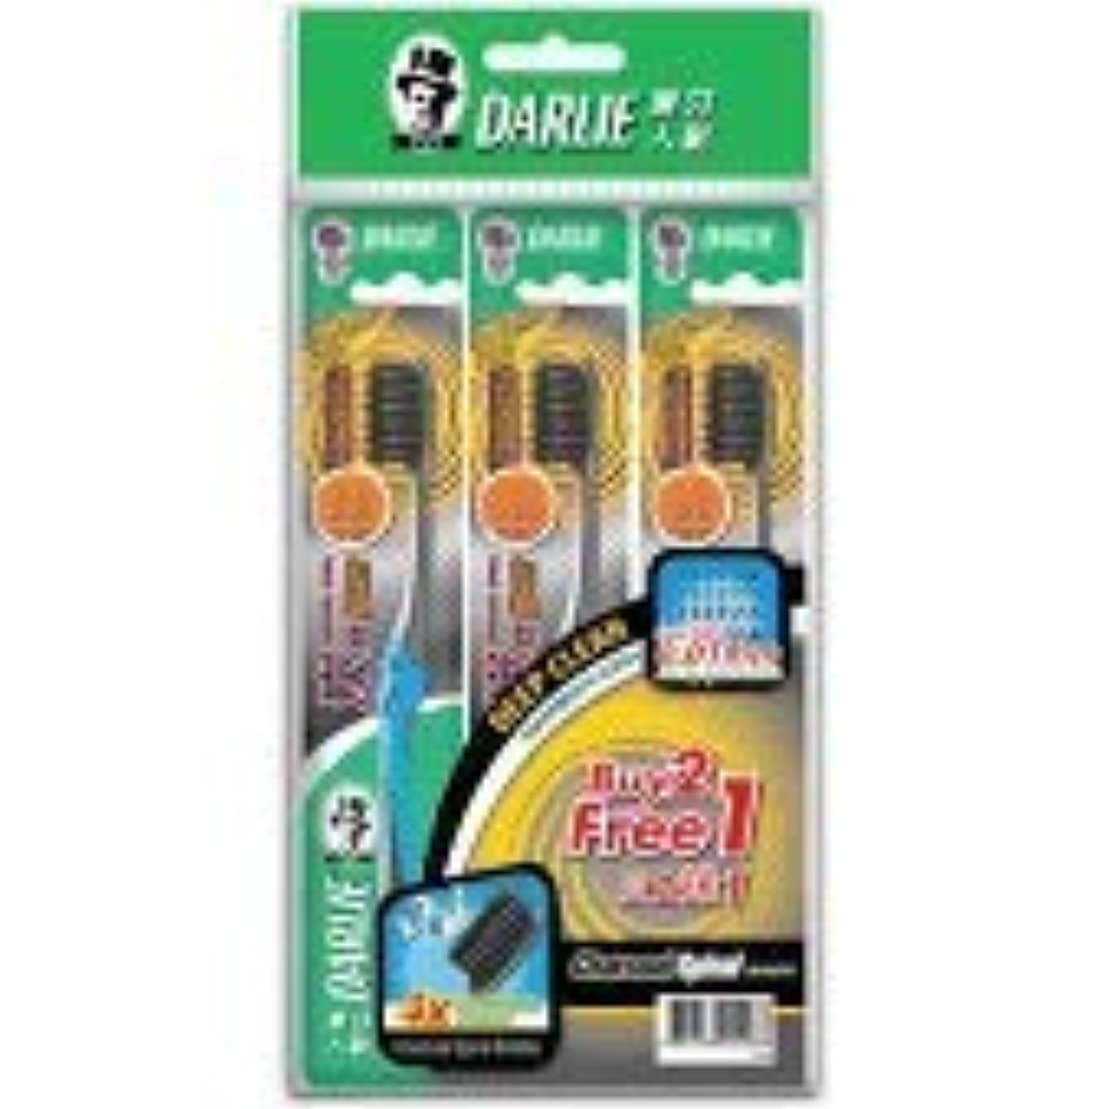 DARLIE 歯の間に深く達する歯ブラシ炭スパイラル b2f1